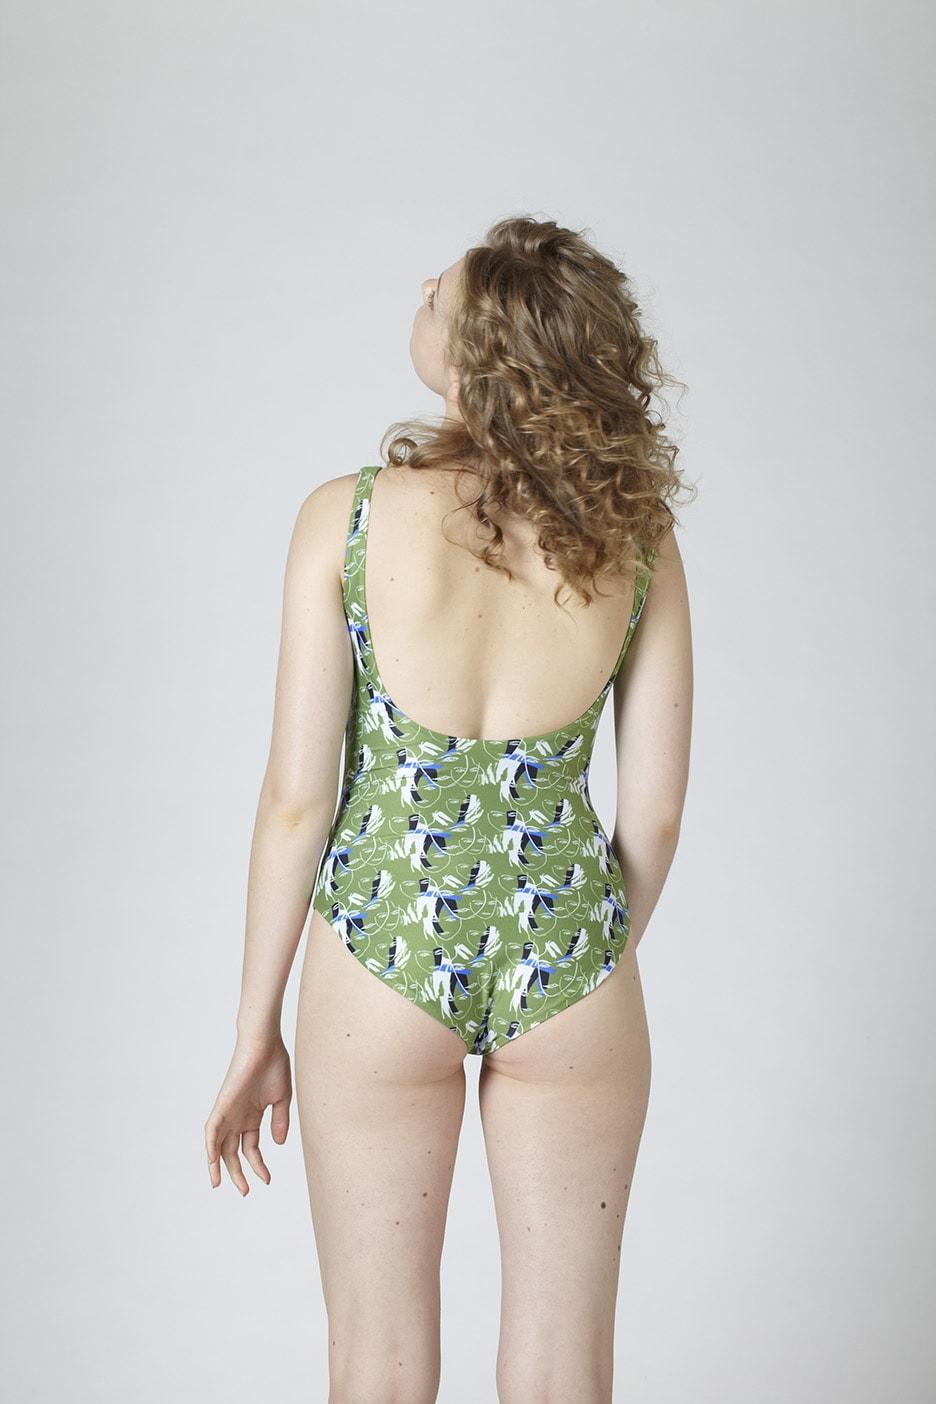 MARGARET AND HERMIONE_Swimsuit No.5_faces_hinten_EUR 2018,00